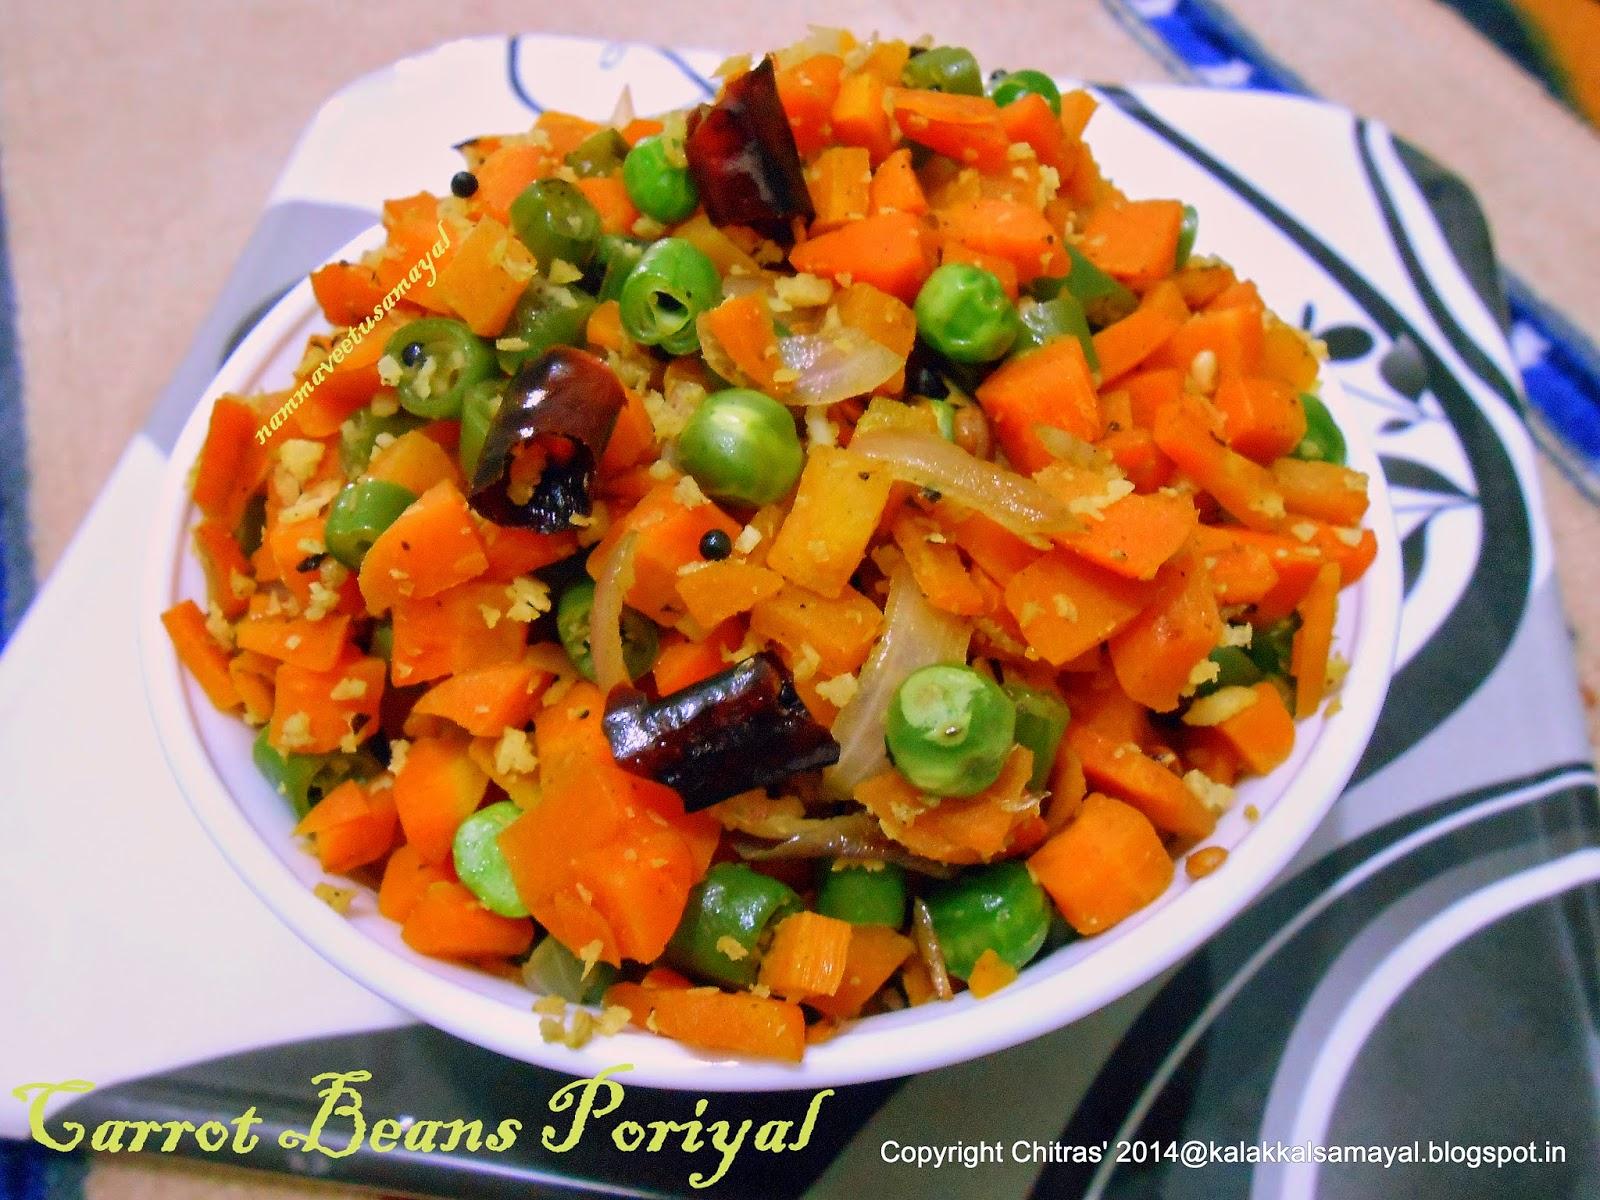 Carrot Beans Poriyal [ Carrot Beans Stirfry ]